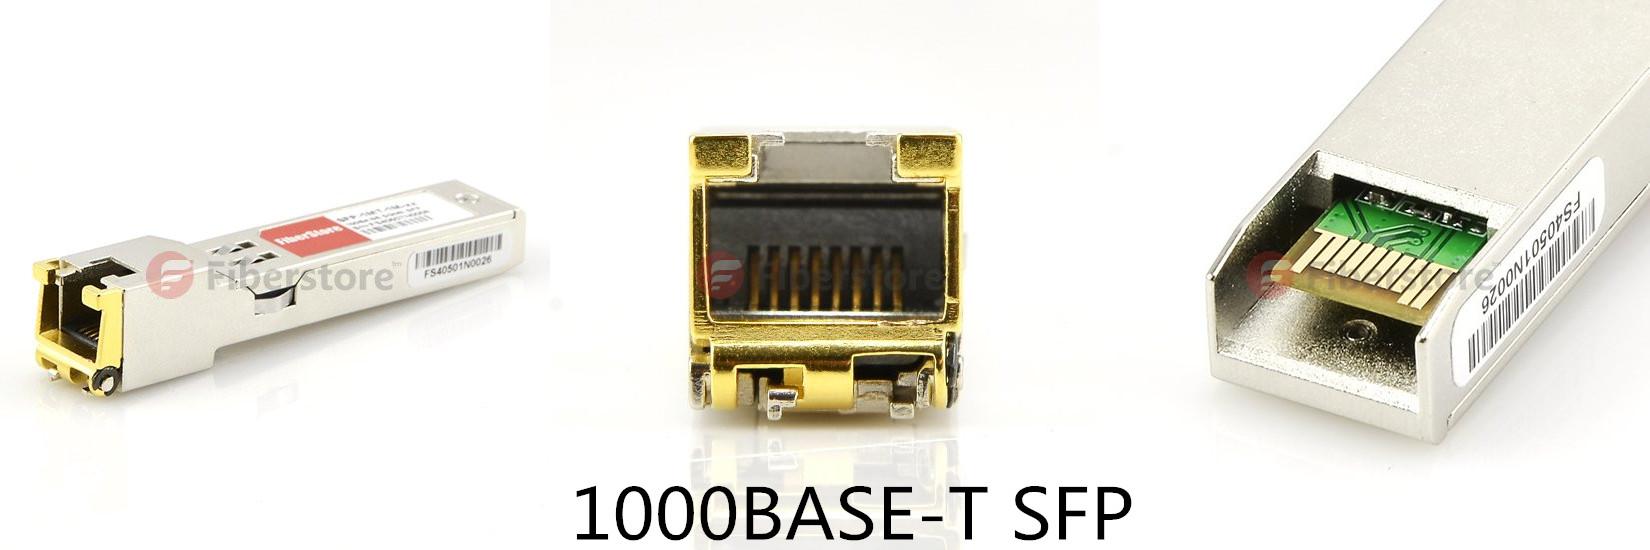 1000BASE-T SFP